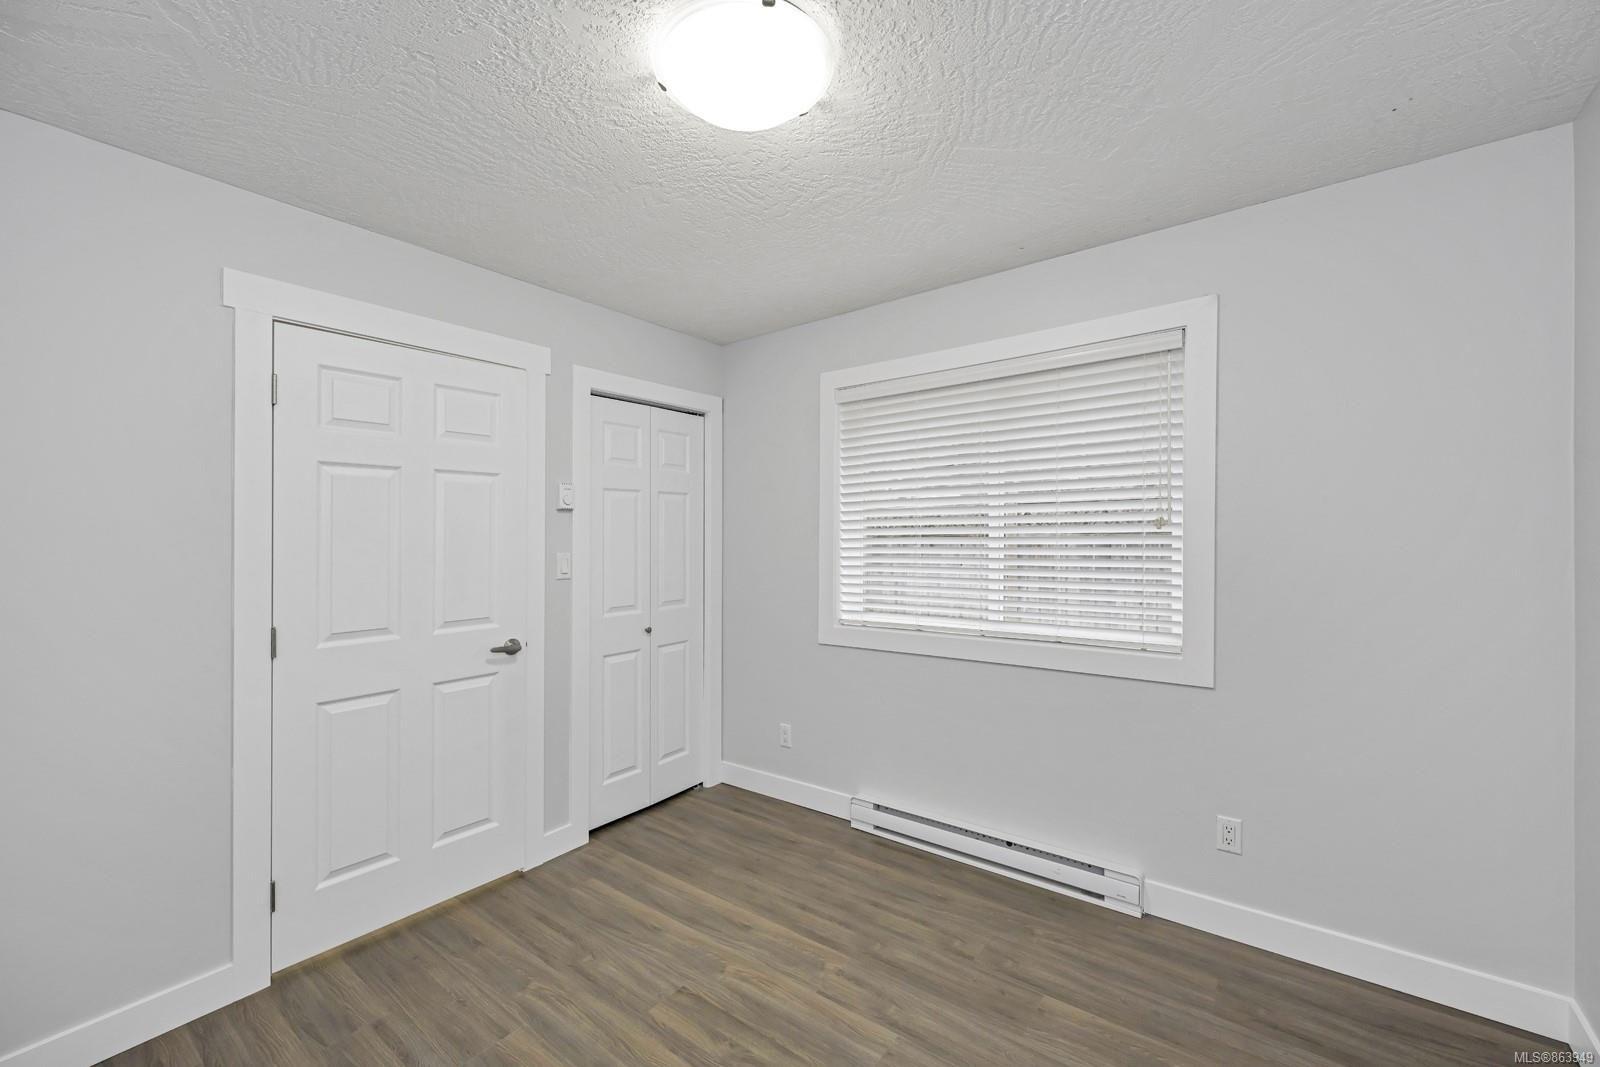 Photo 19: Photos: 6154 Sayward Rd in : Du West Duncan Half Duplex for sale (Duncan)  : MLS®# 863949